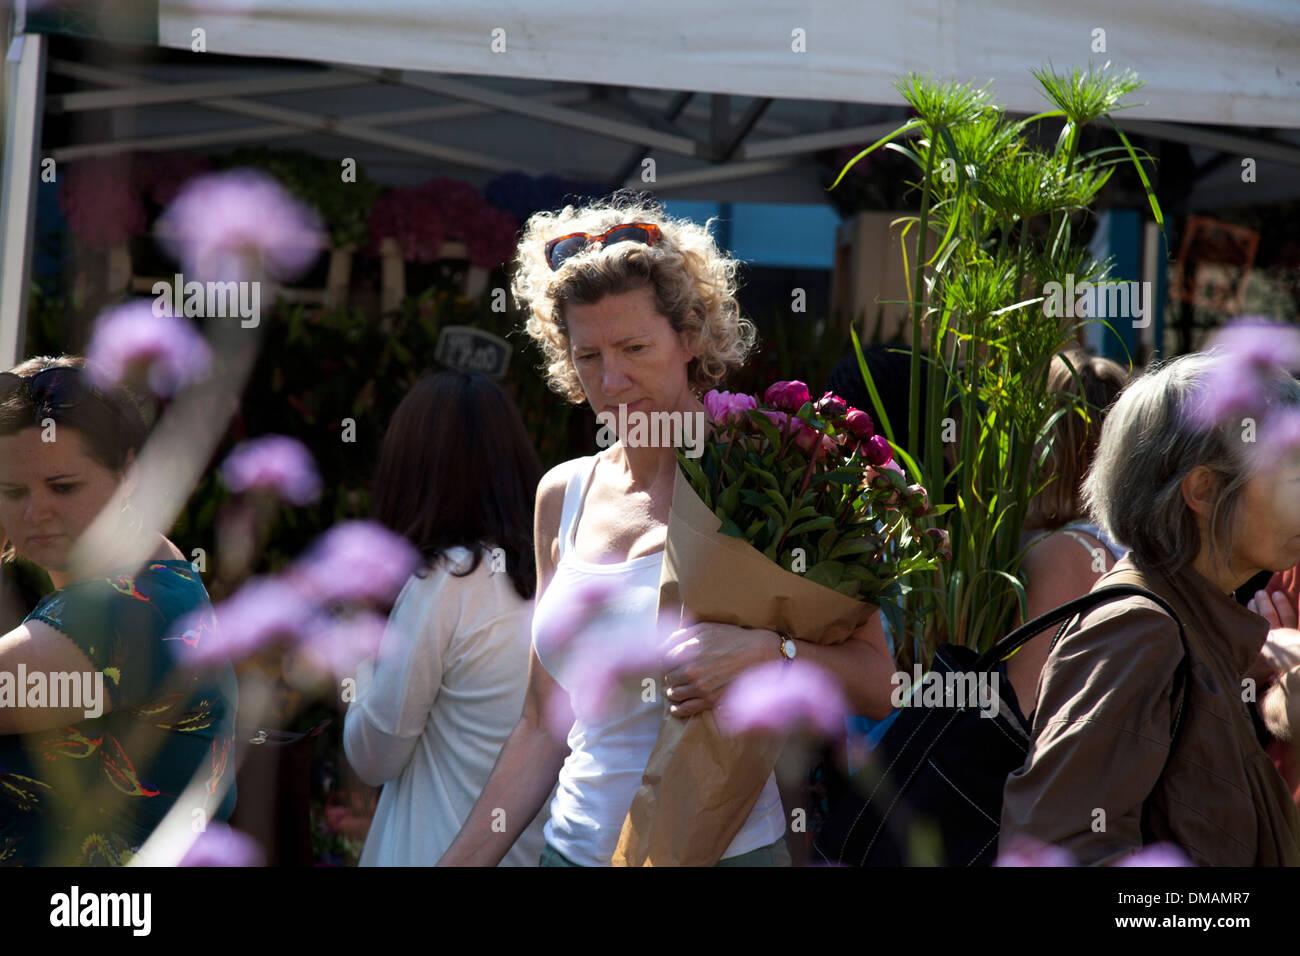 Columbia Road flower market, east London - Stock Image